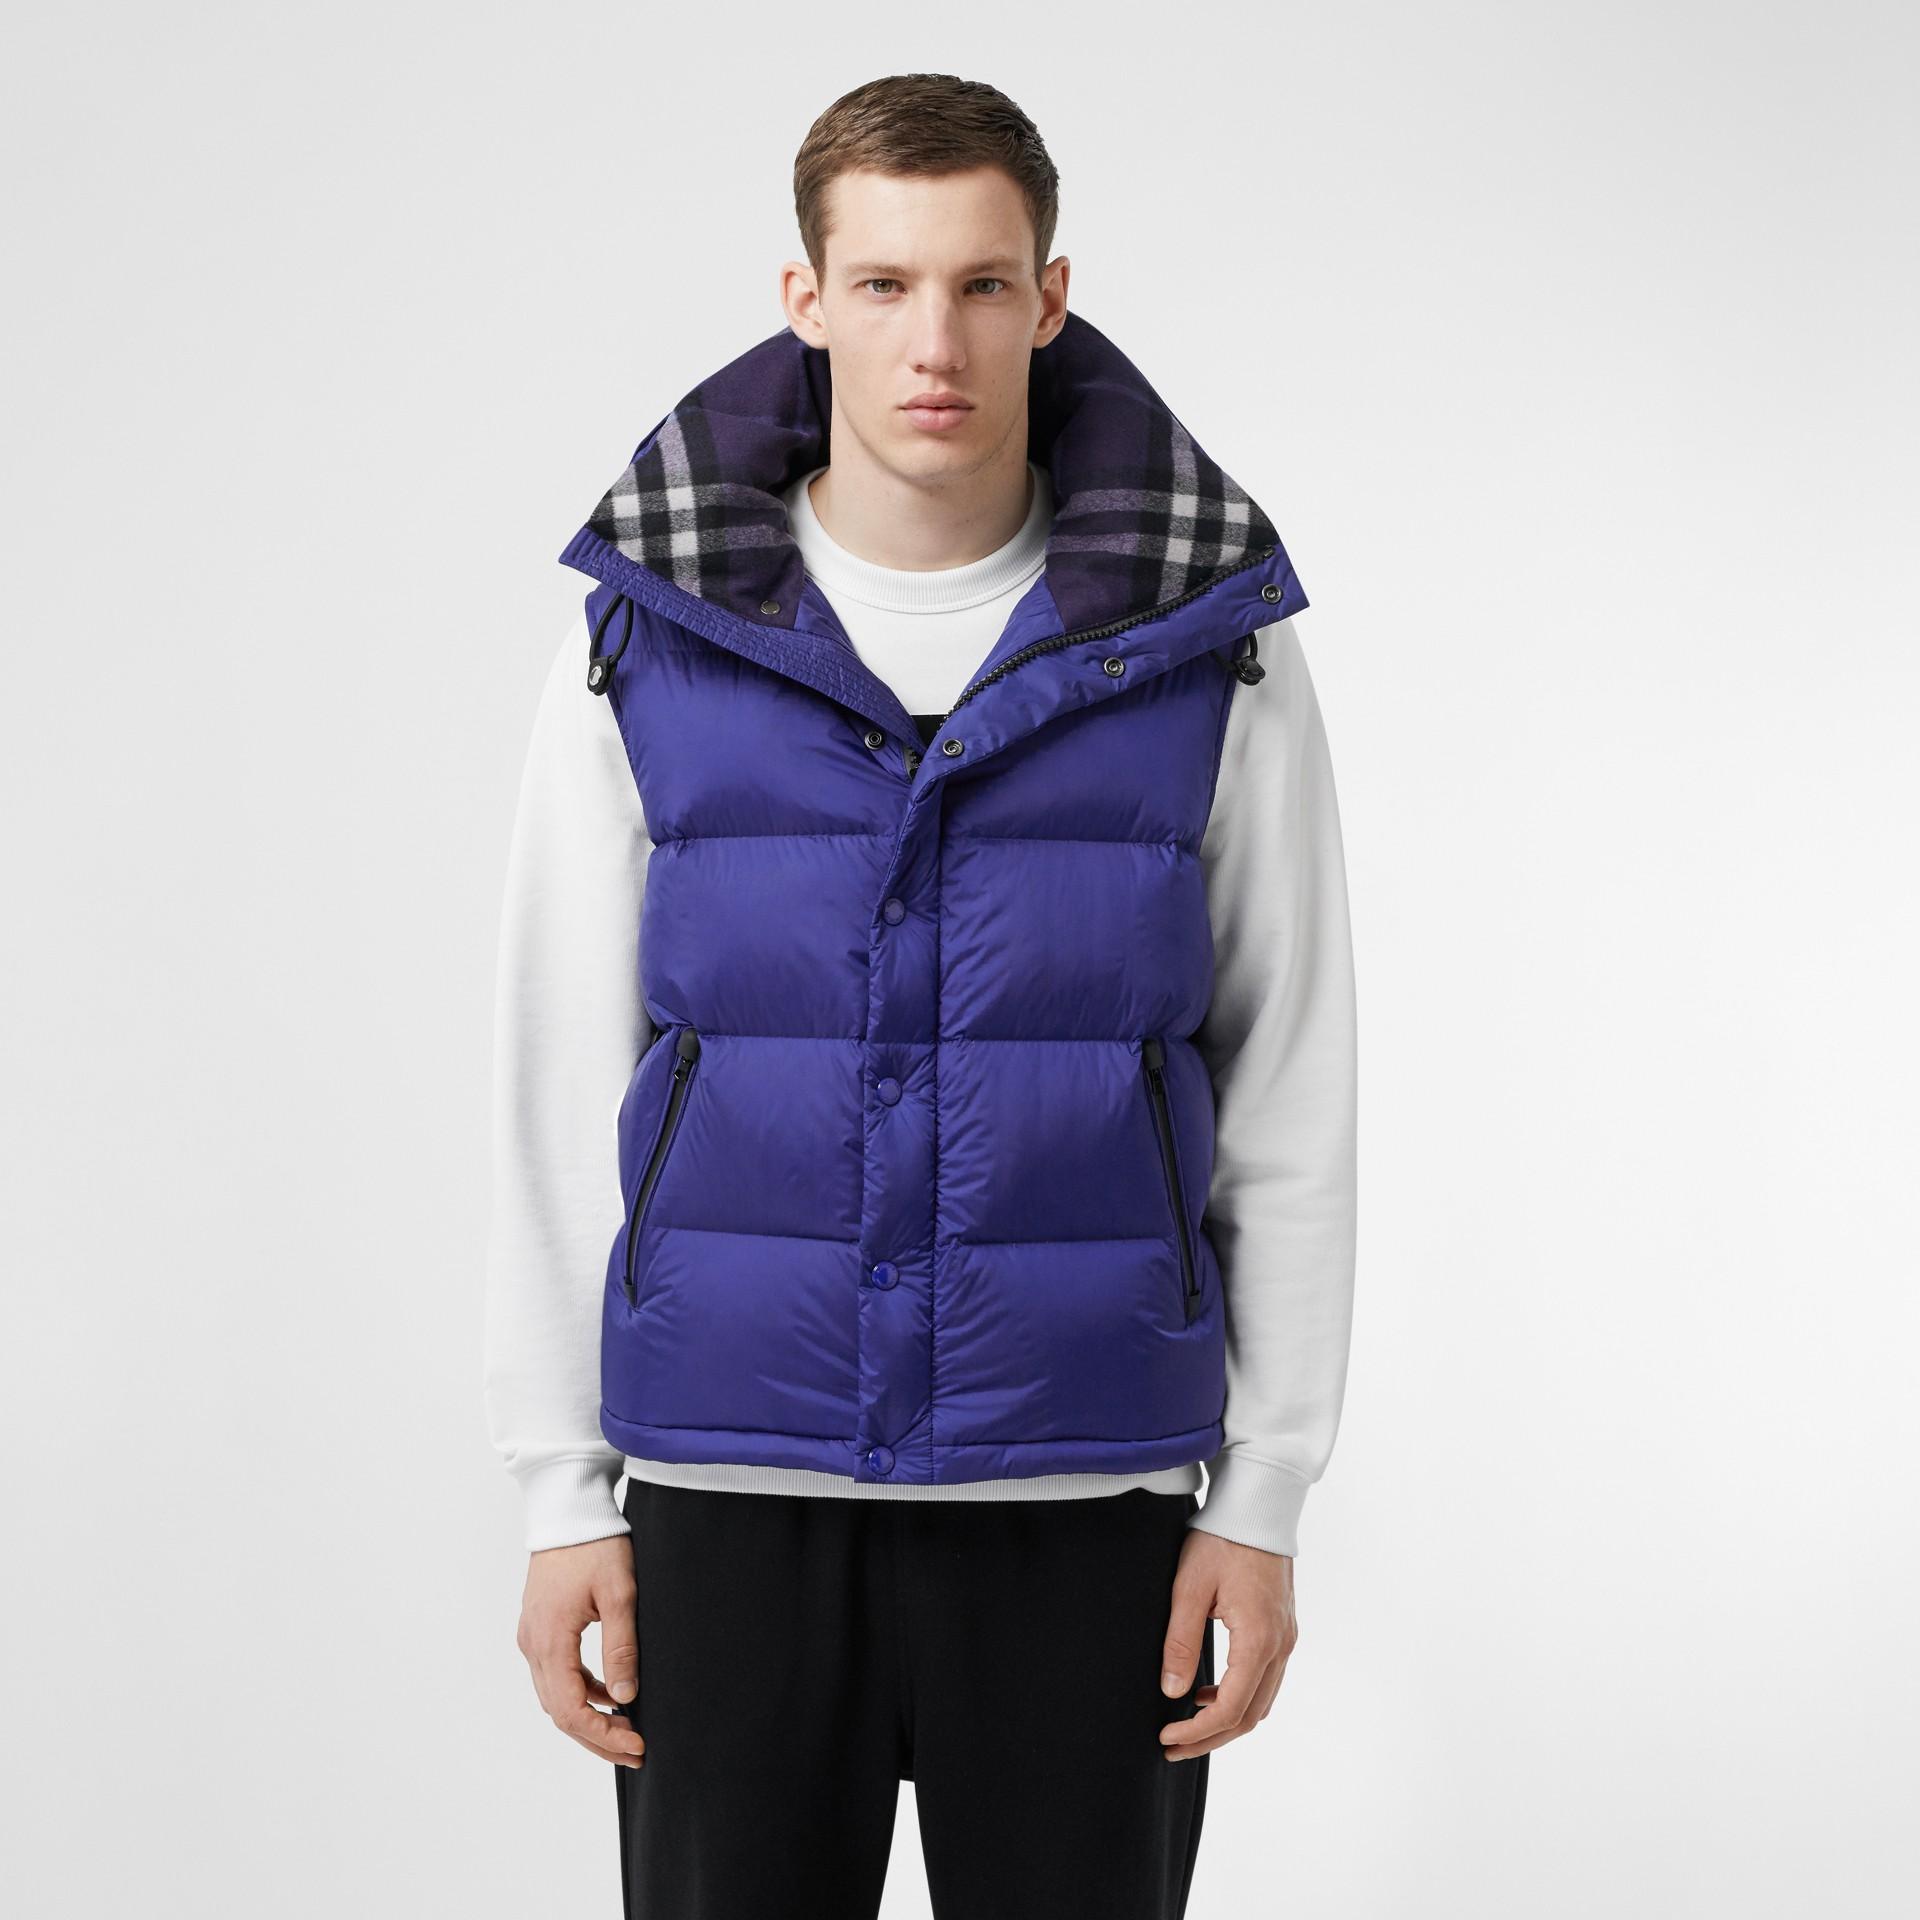 Detachable Sleeve Hooded Puffer Jacket in Dark Cobalt Blue - Men | Burberry - gallery image 5